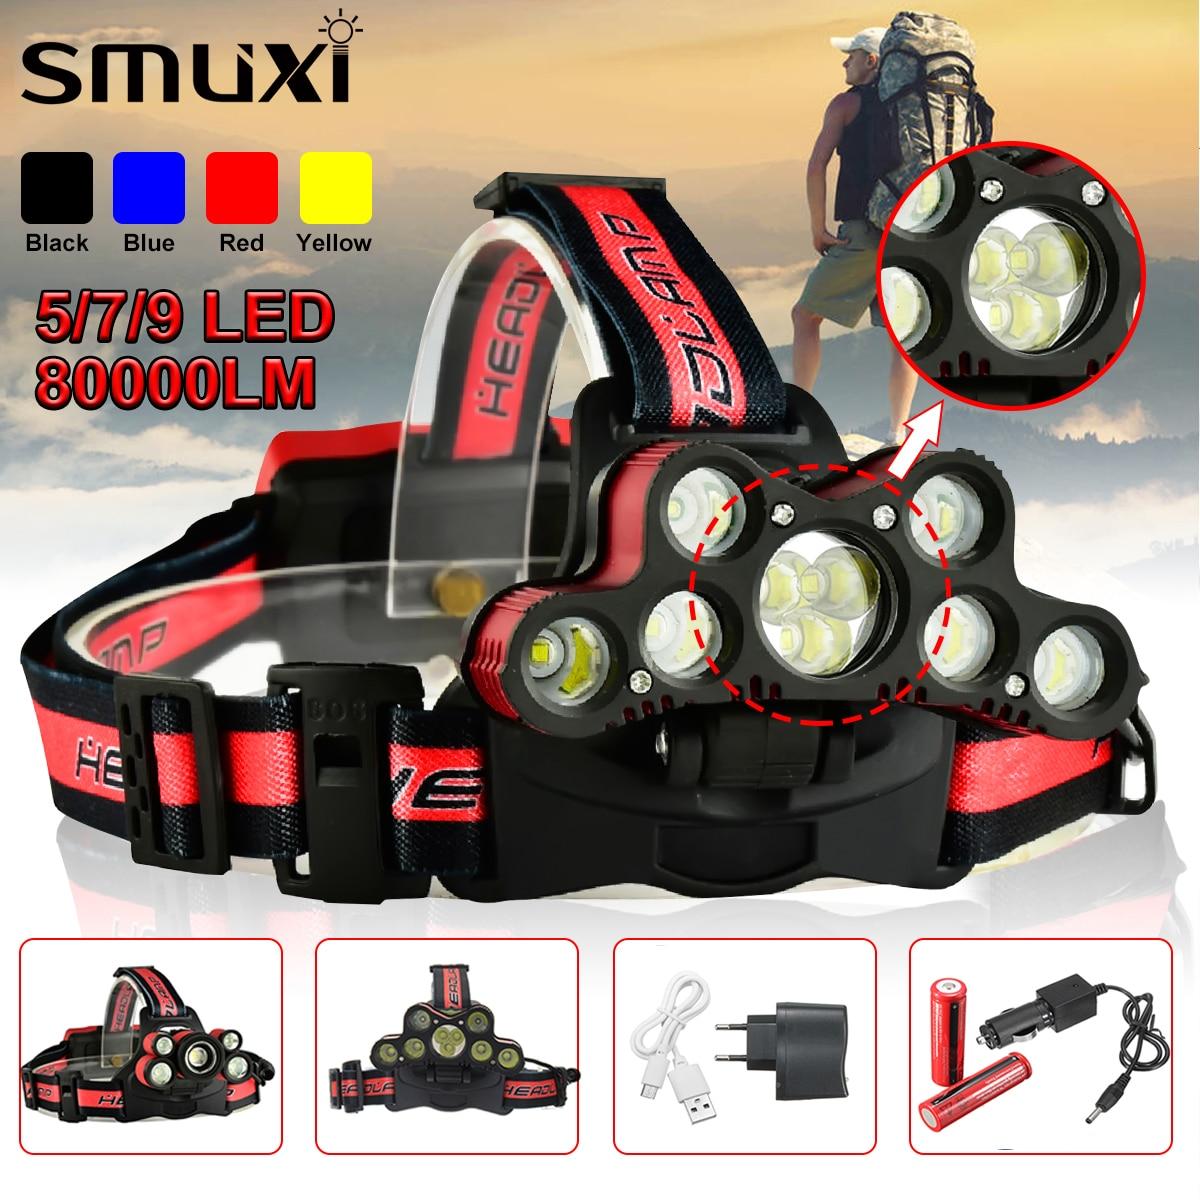 Smuxi LED Headlamp 80000LM 5/7/9 LED T6 Headlight Head Flashlight Torch Forehead USB Rechargeable Head Lamp Fishing Headlights